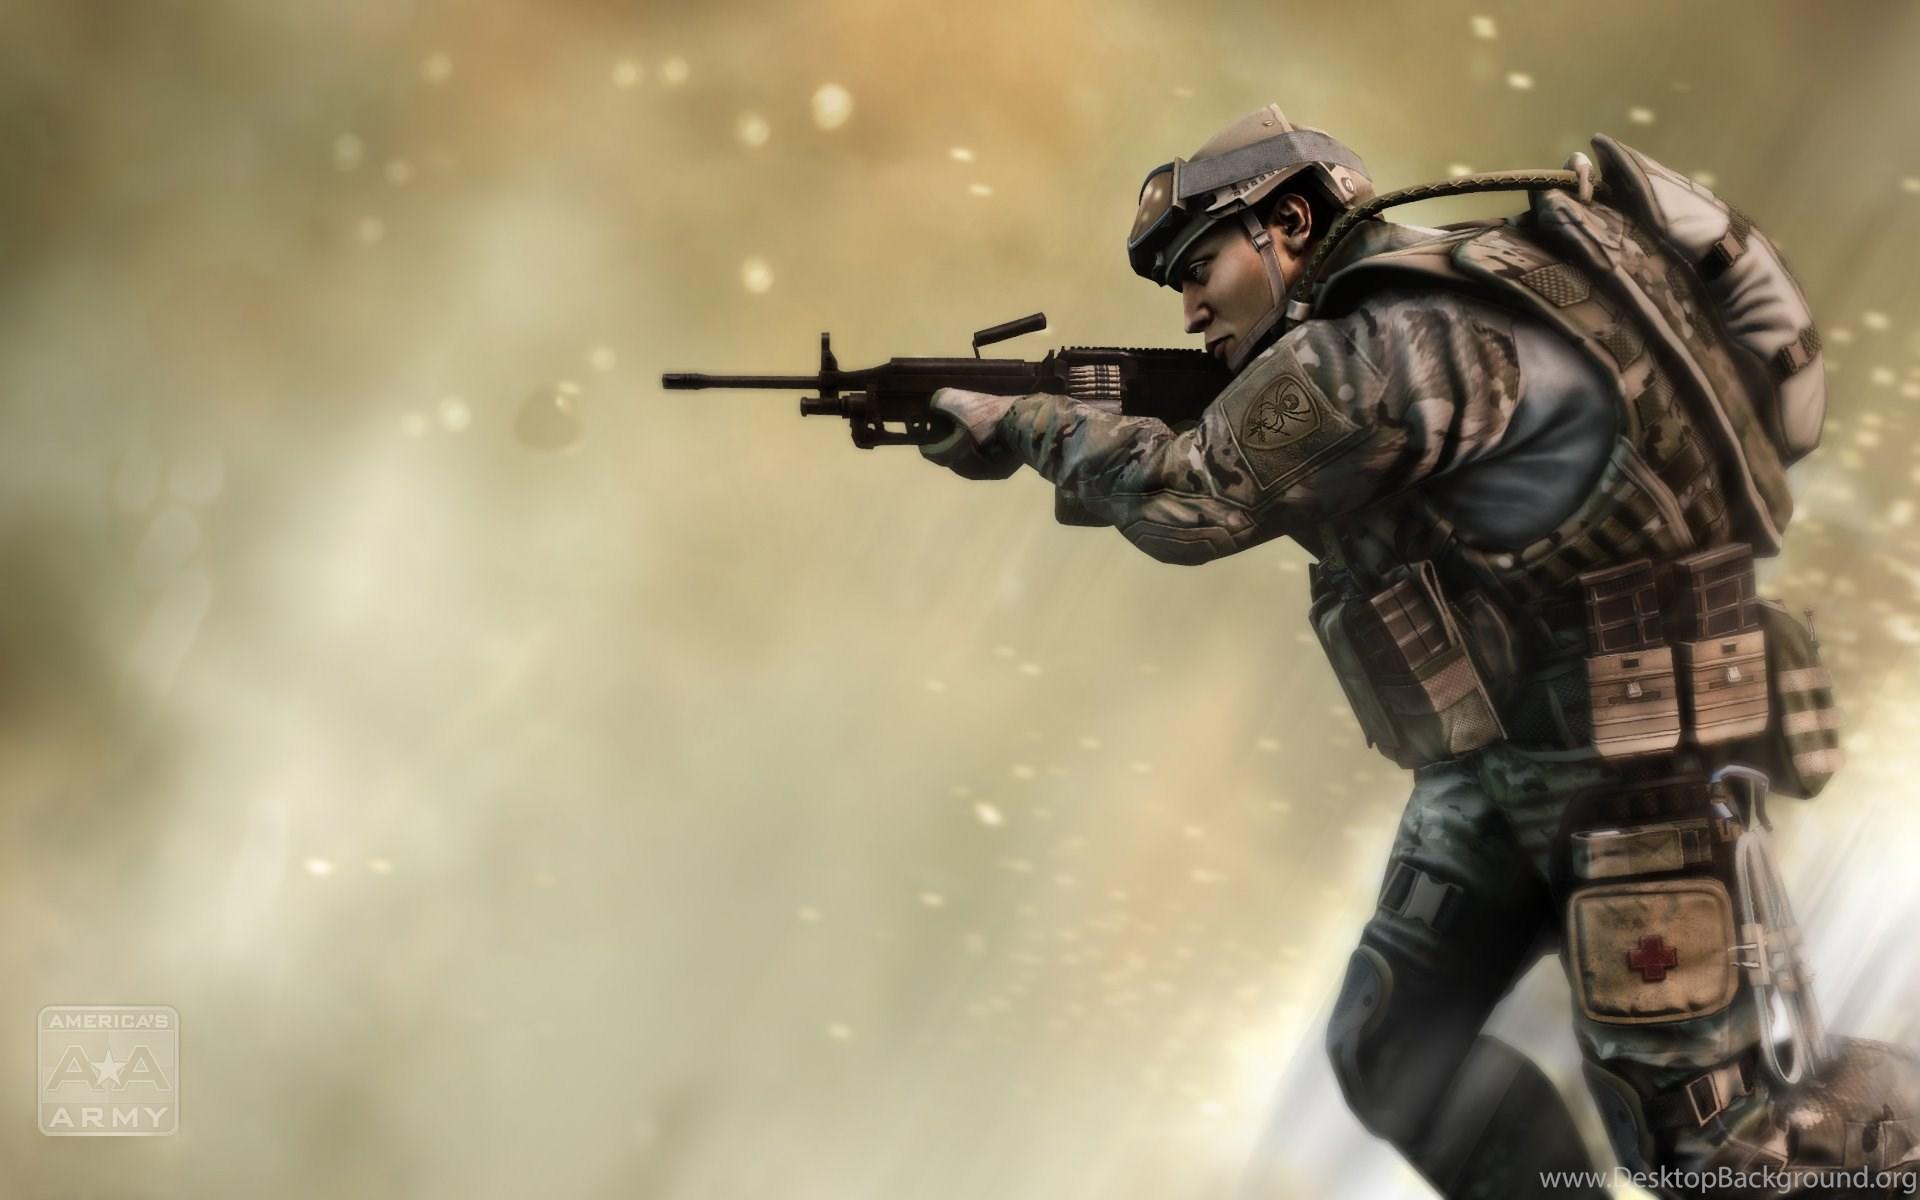 Hd War Soldier Army Desktop Wallpapers Full Size Hirewallpapers 12550 Desktop Background